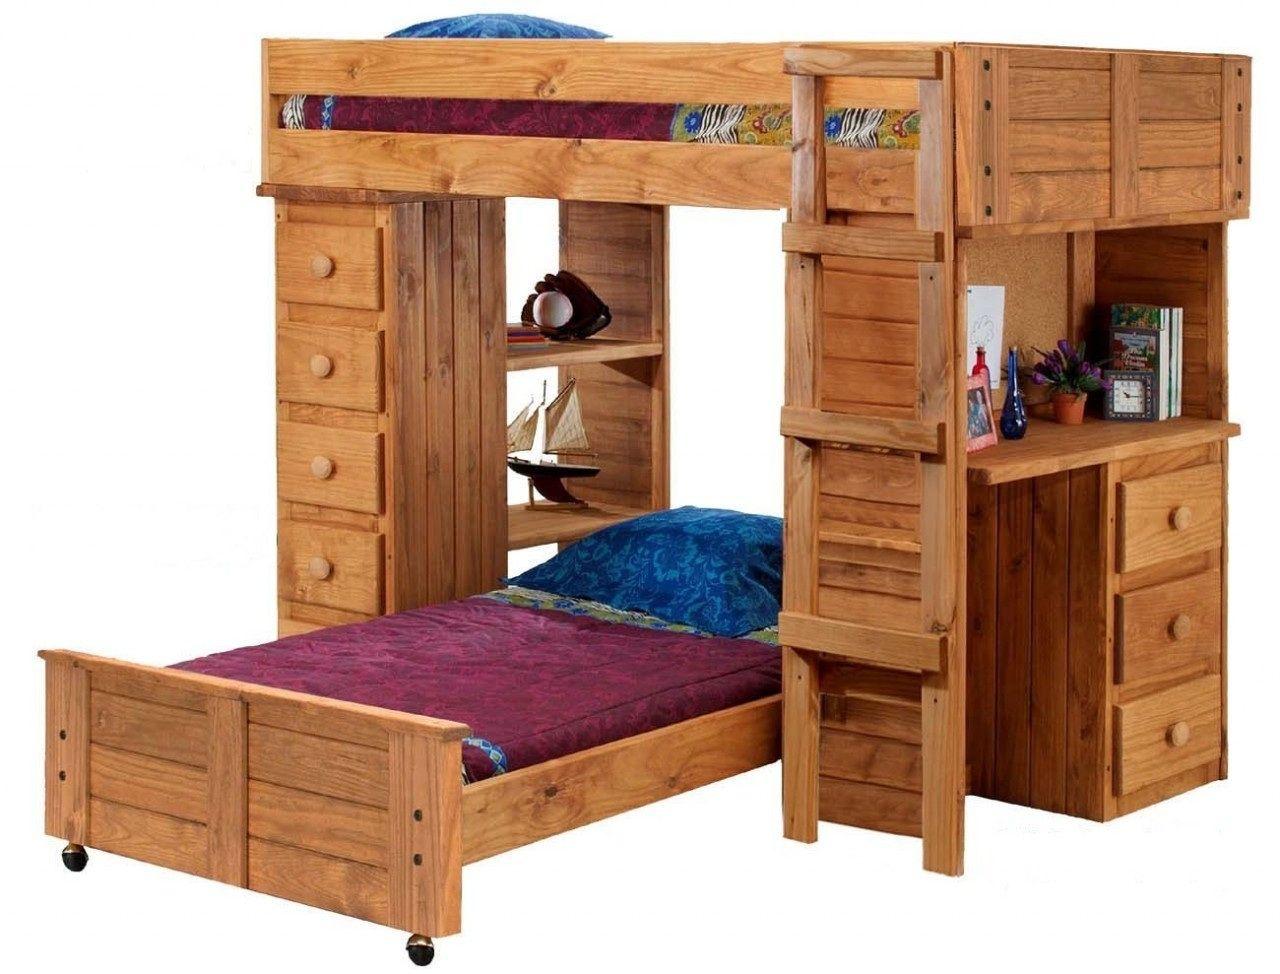 Pine loft bed with desk   Wooden Loft Bunk Beds  Interior Design for Bedrooms Check more